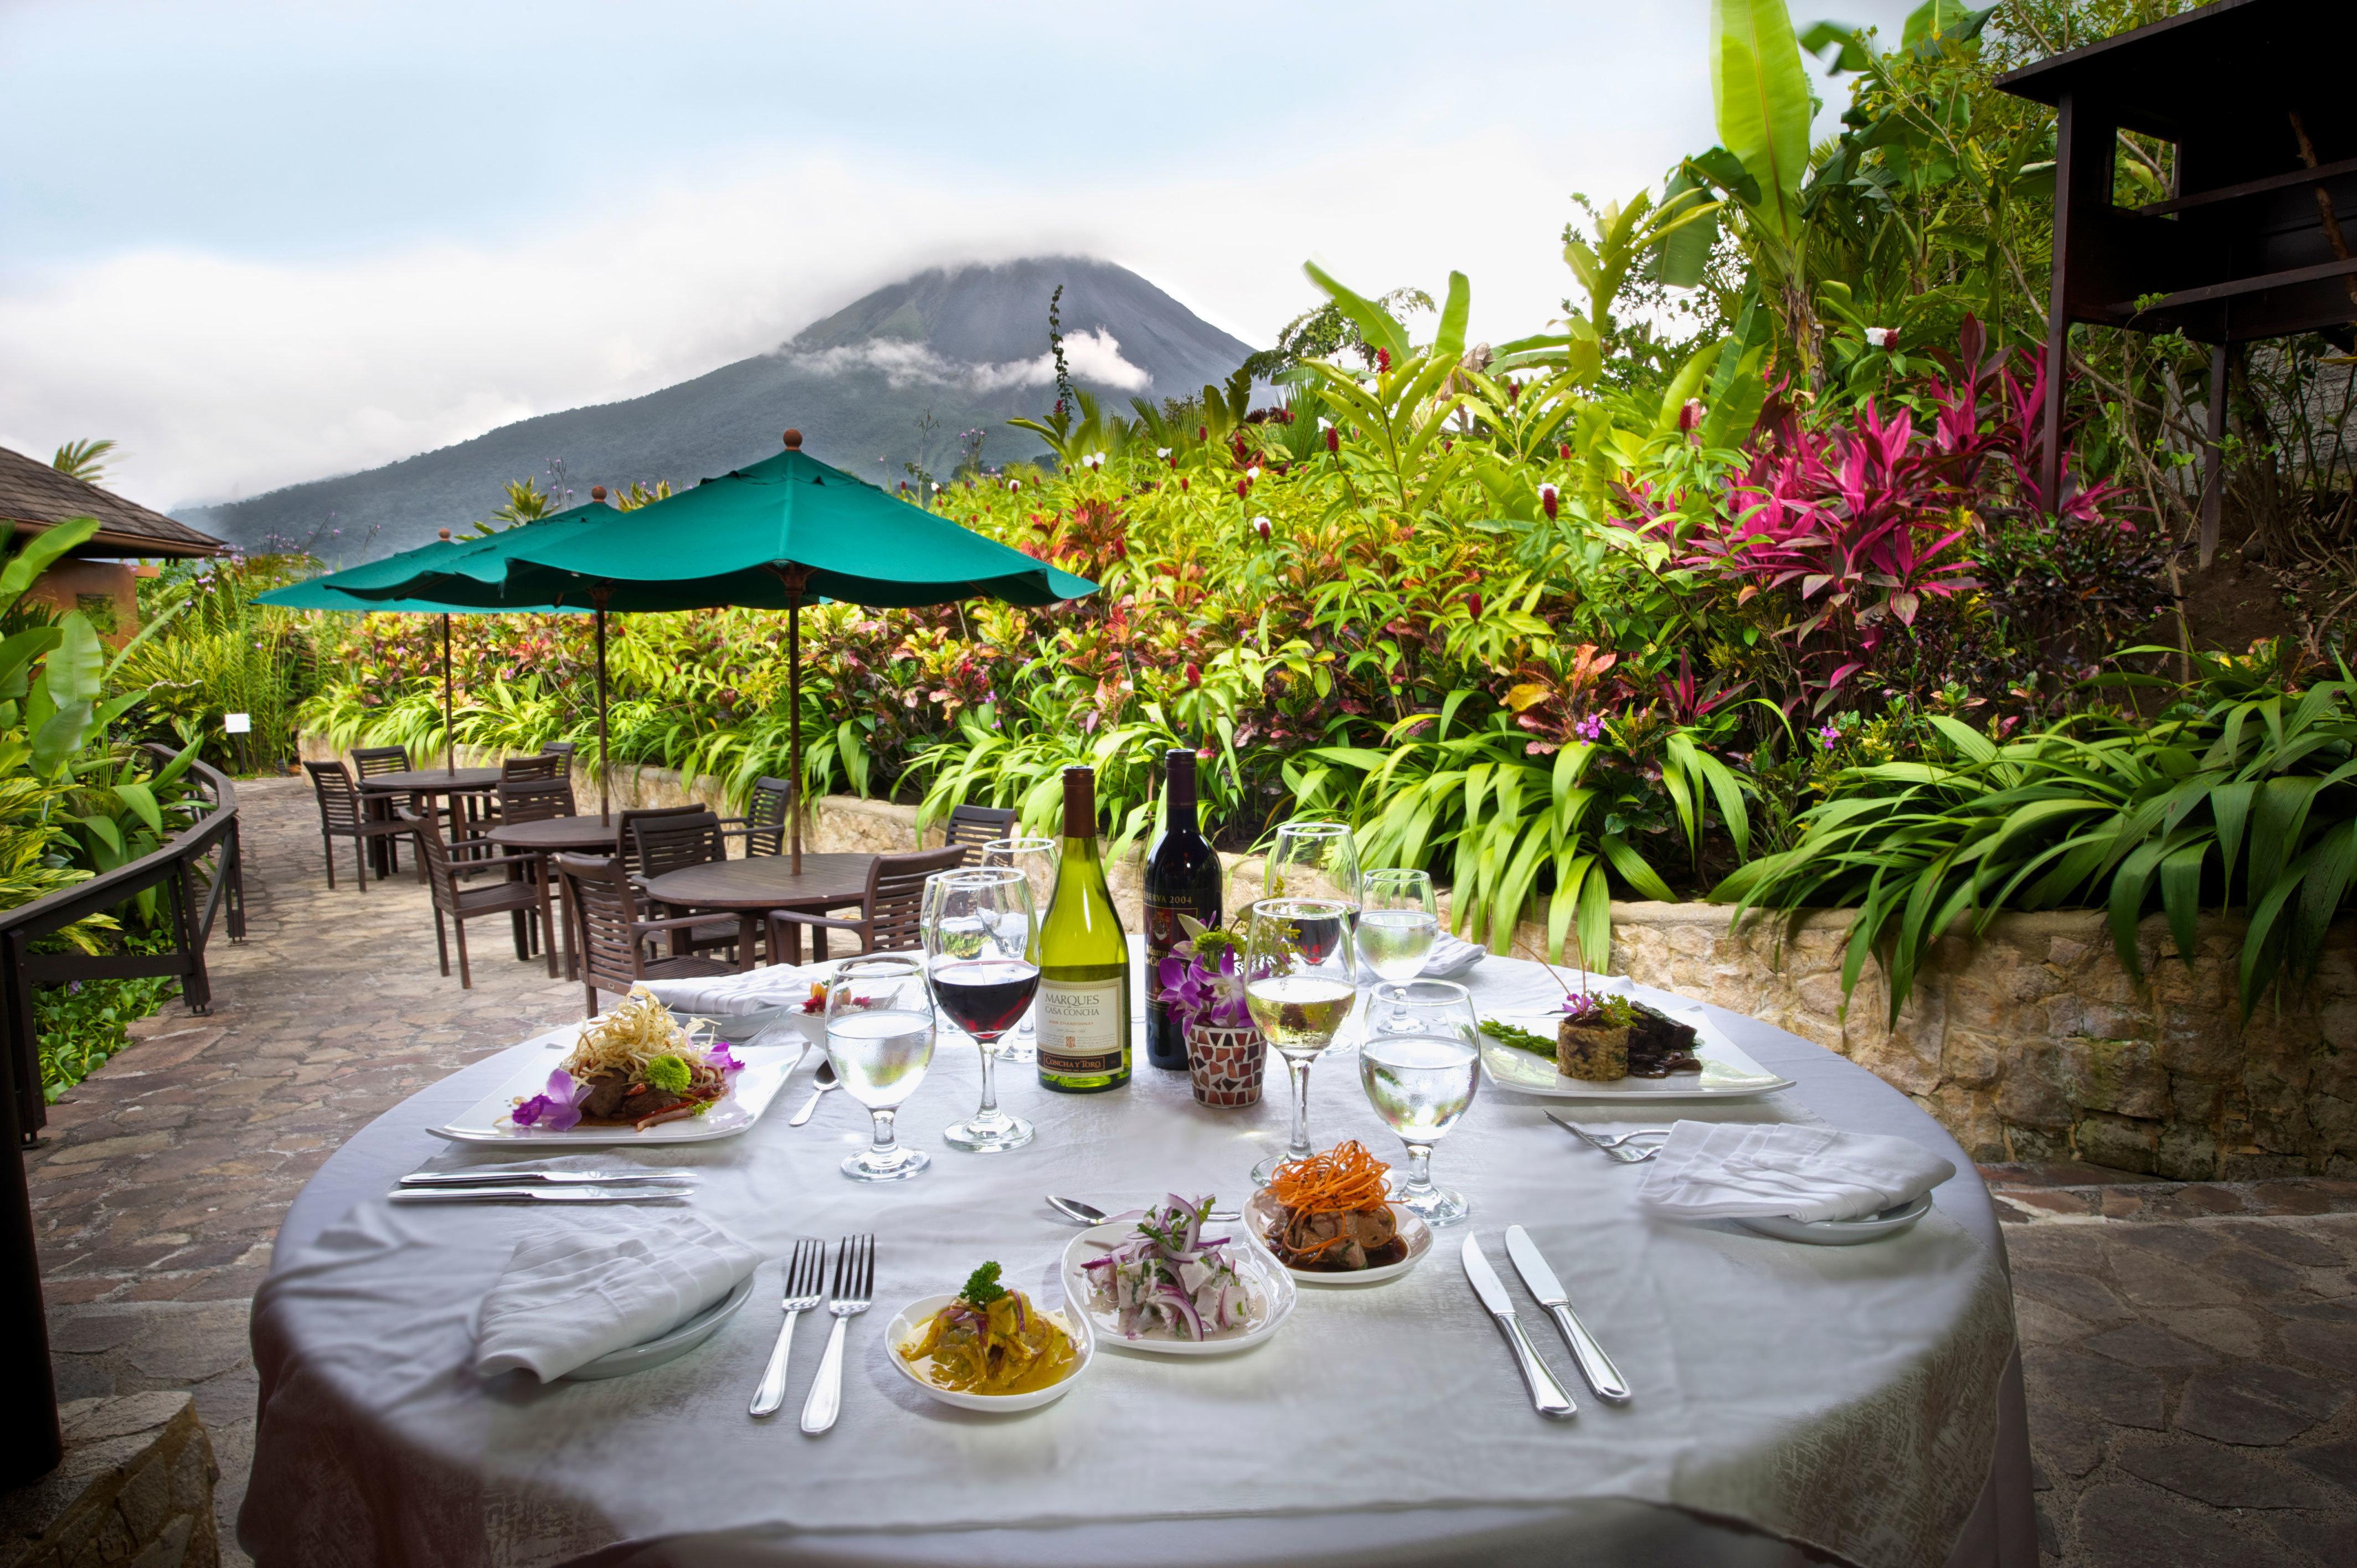 Country Dining Drink Eat Eco Jungle Mountains Romantic Rustic Scenic views Resort restaurant backyard Villa hacienda flower set